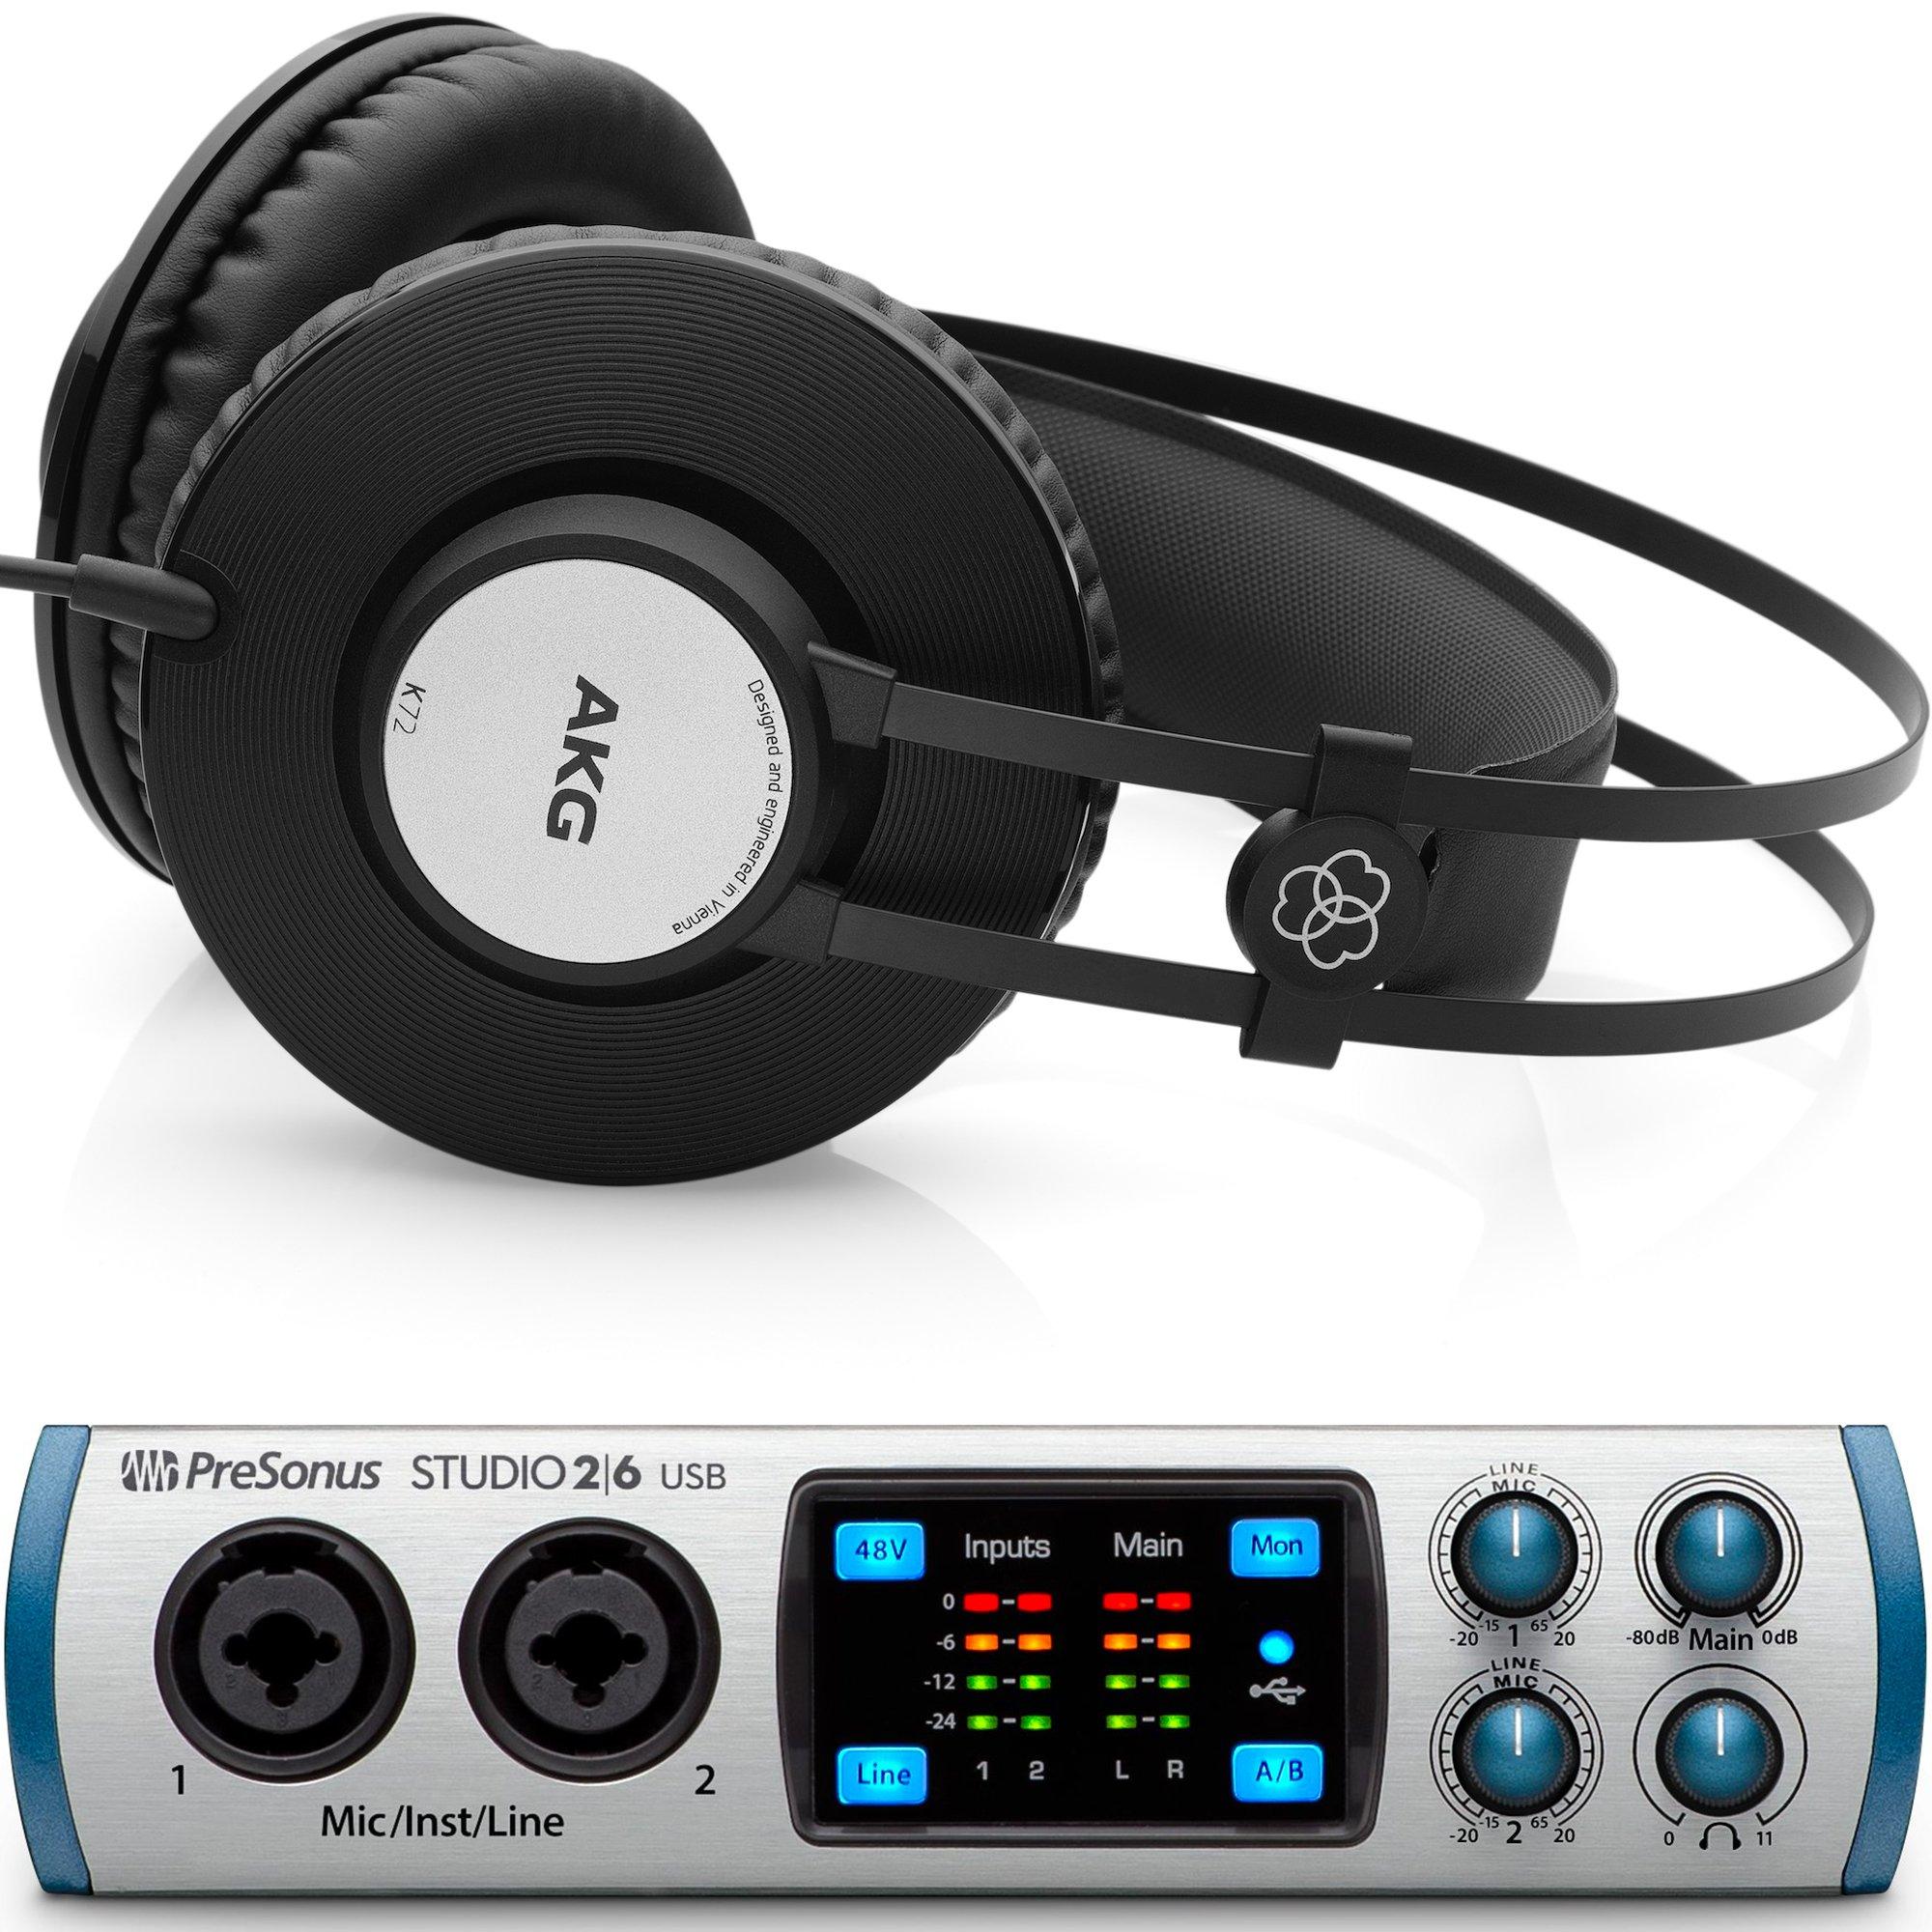 Presonus Studio 26 USB Audio Interface with AKG K72 Closed Back Studio Headphones